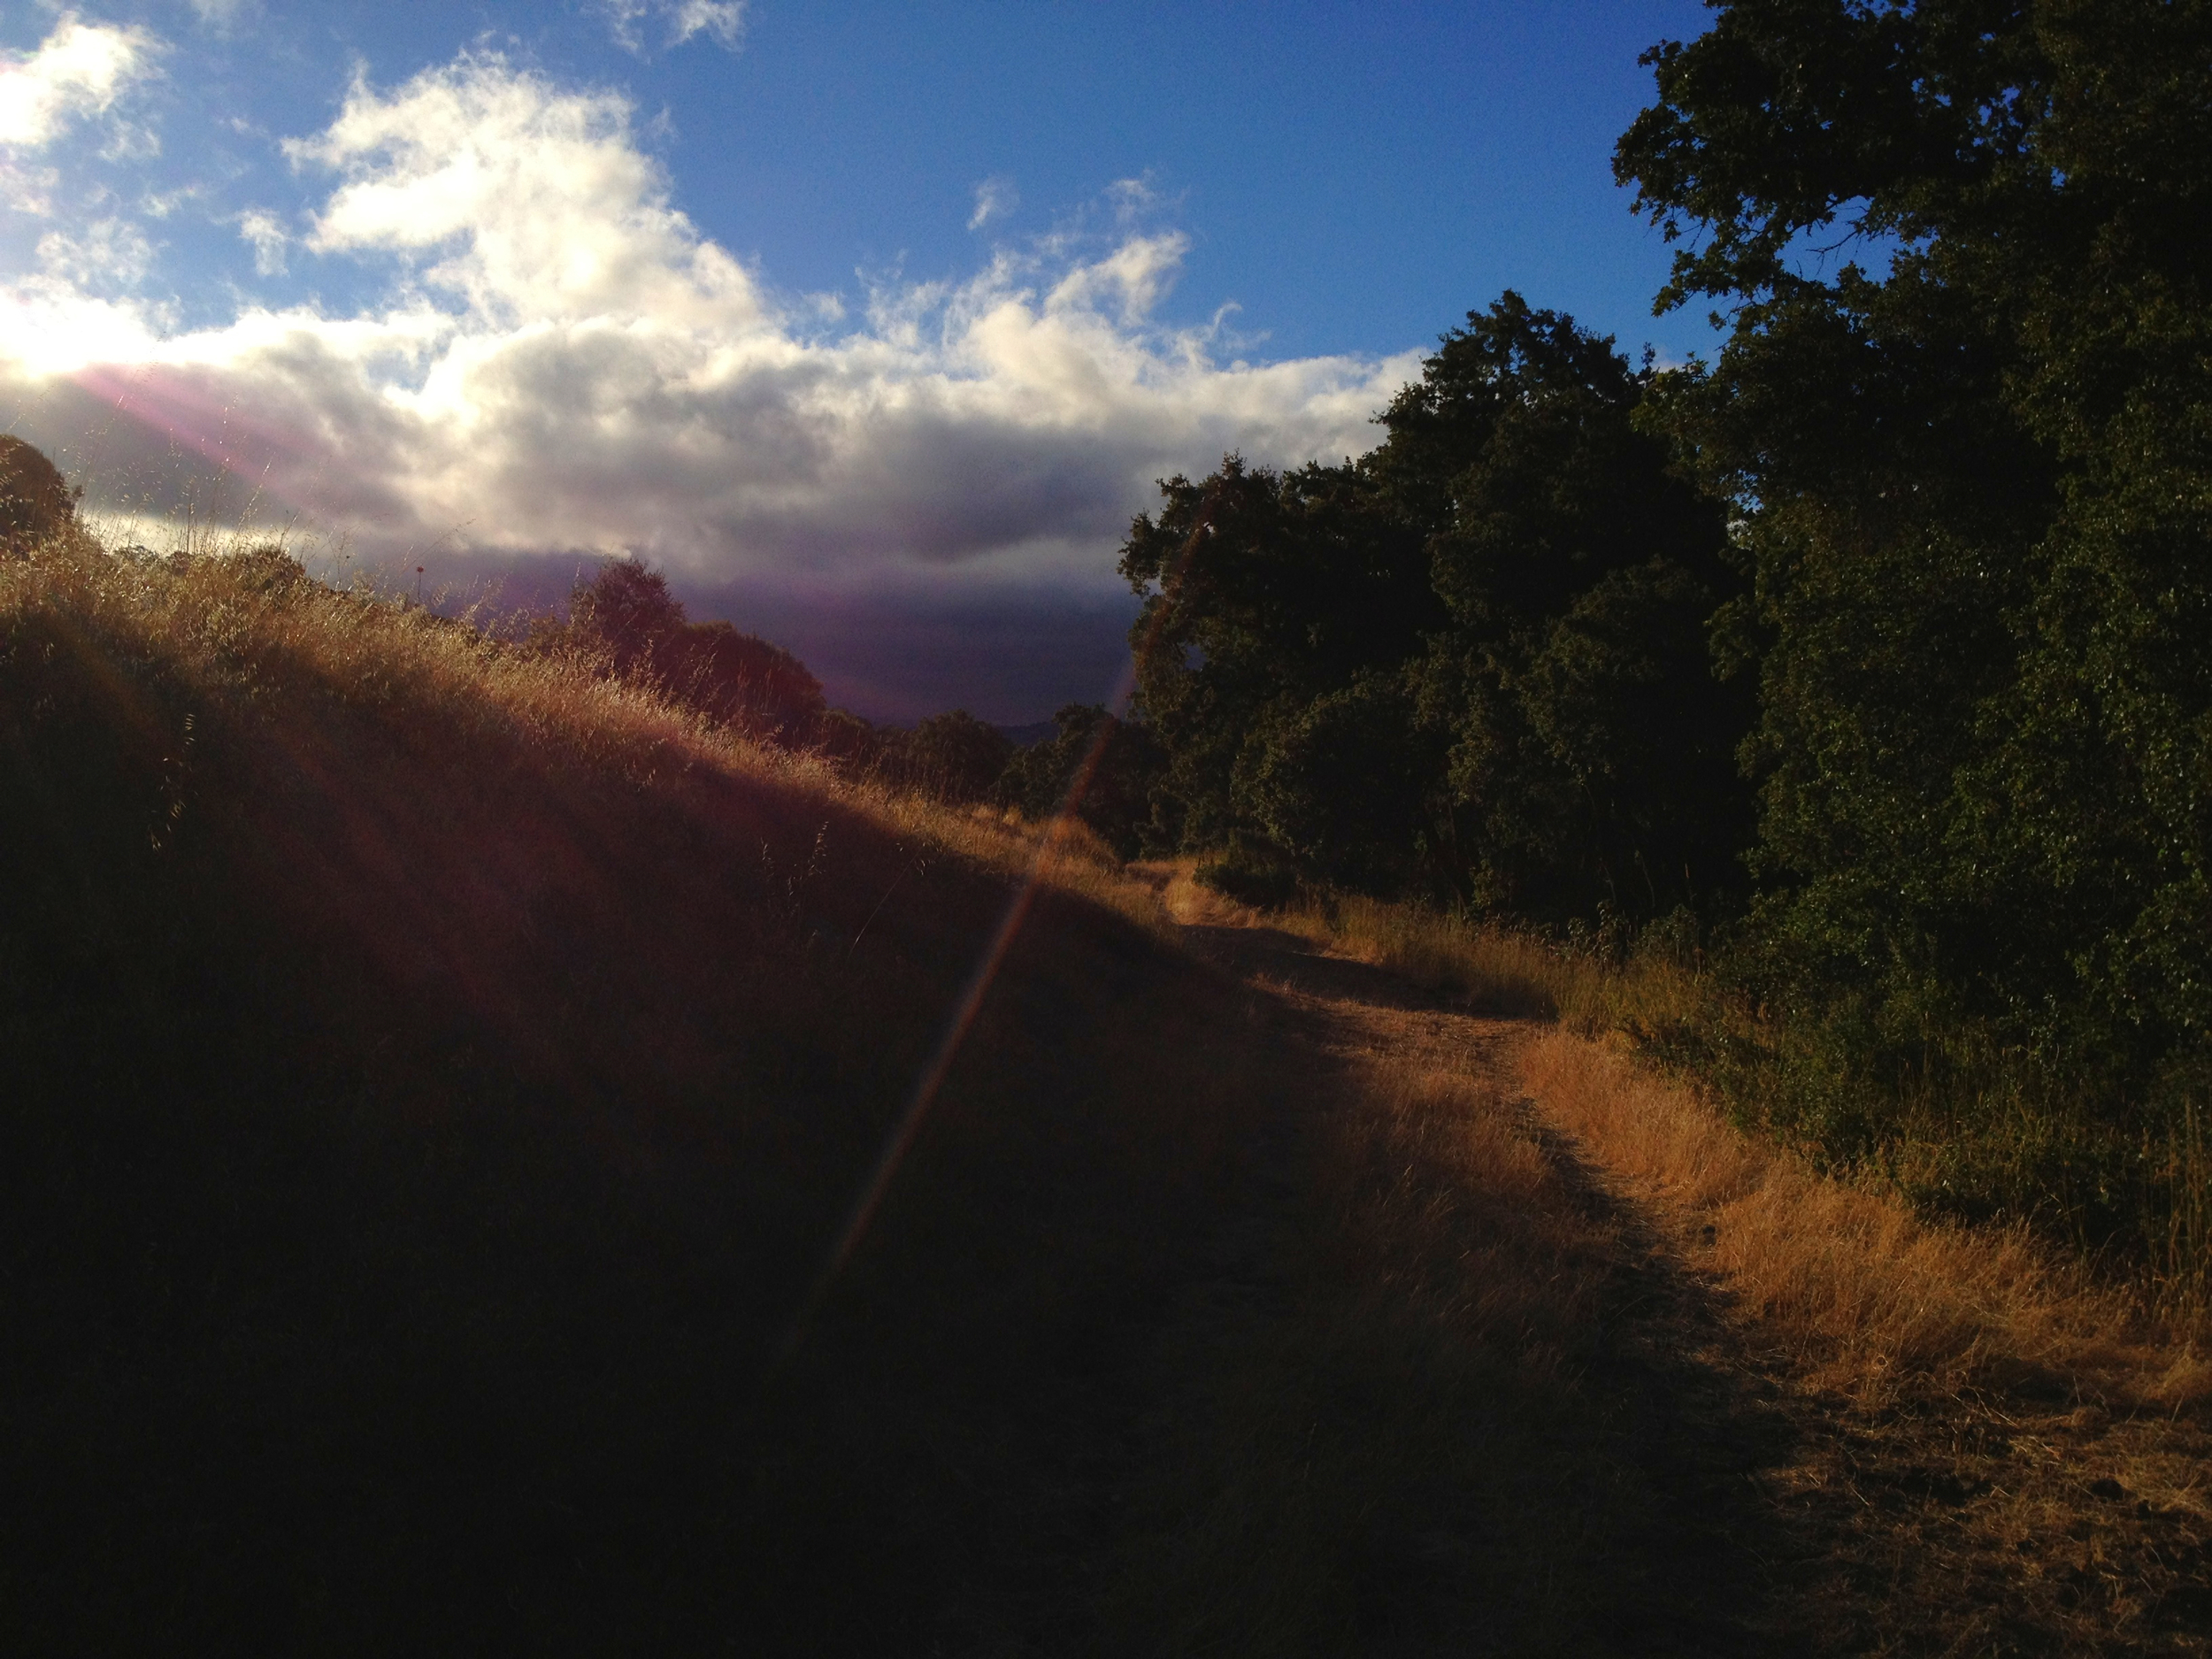 A Path in the Shadows.